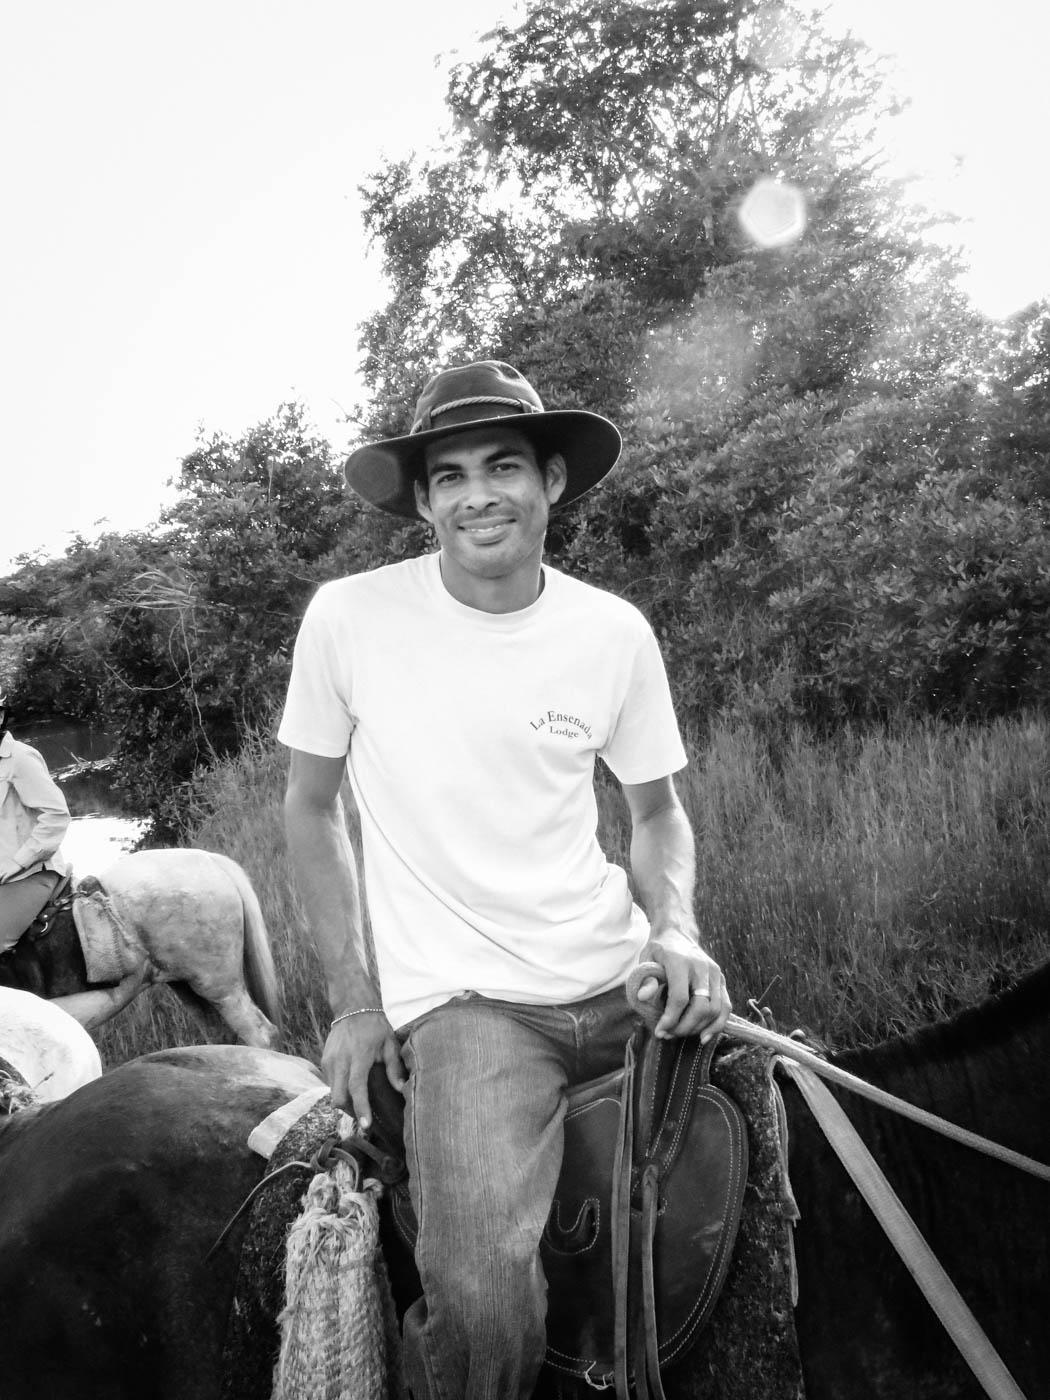 Costa Rica Travel - Horse Riding Adventure I Rainforest I Beach I The Discoveries Of Travel Blog #traveltips #holidaydestinations - 9